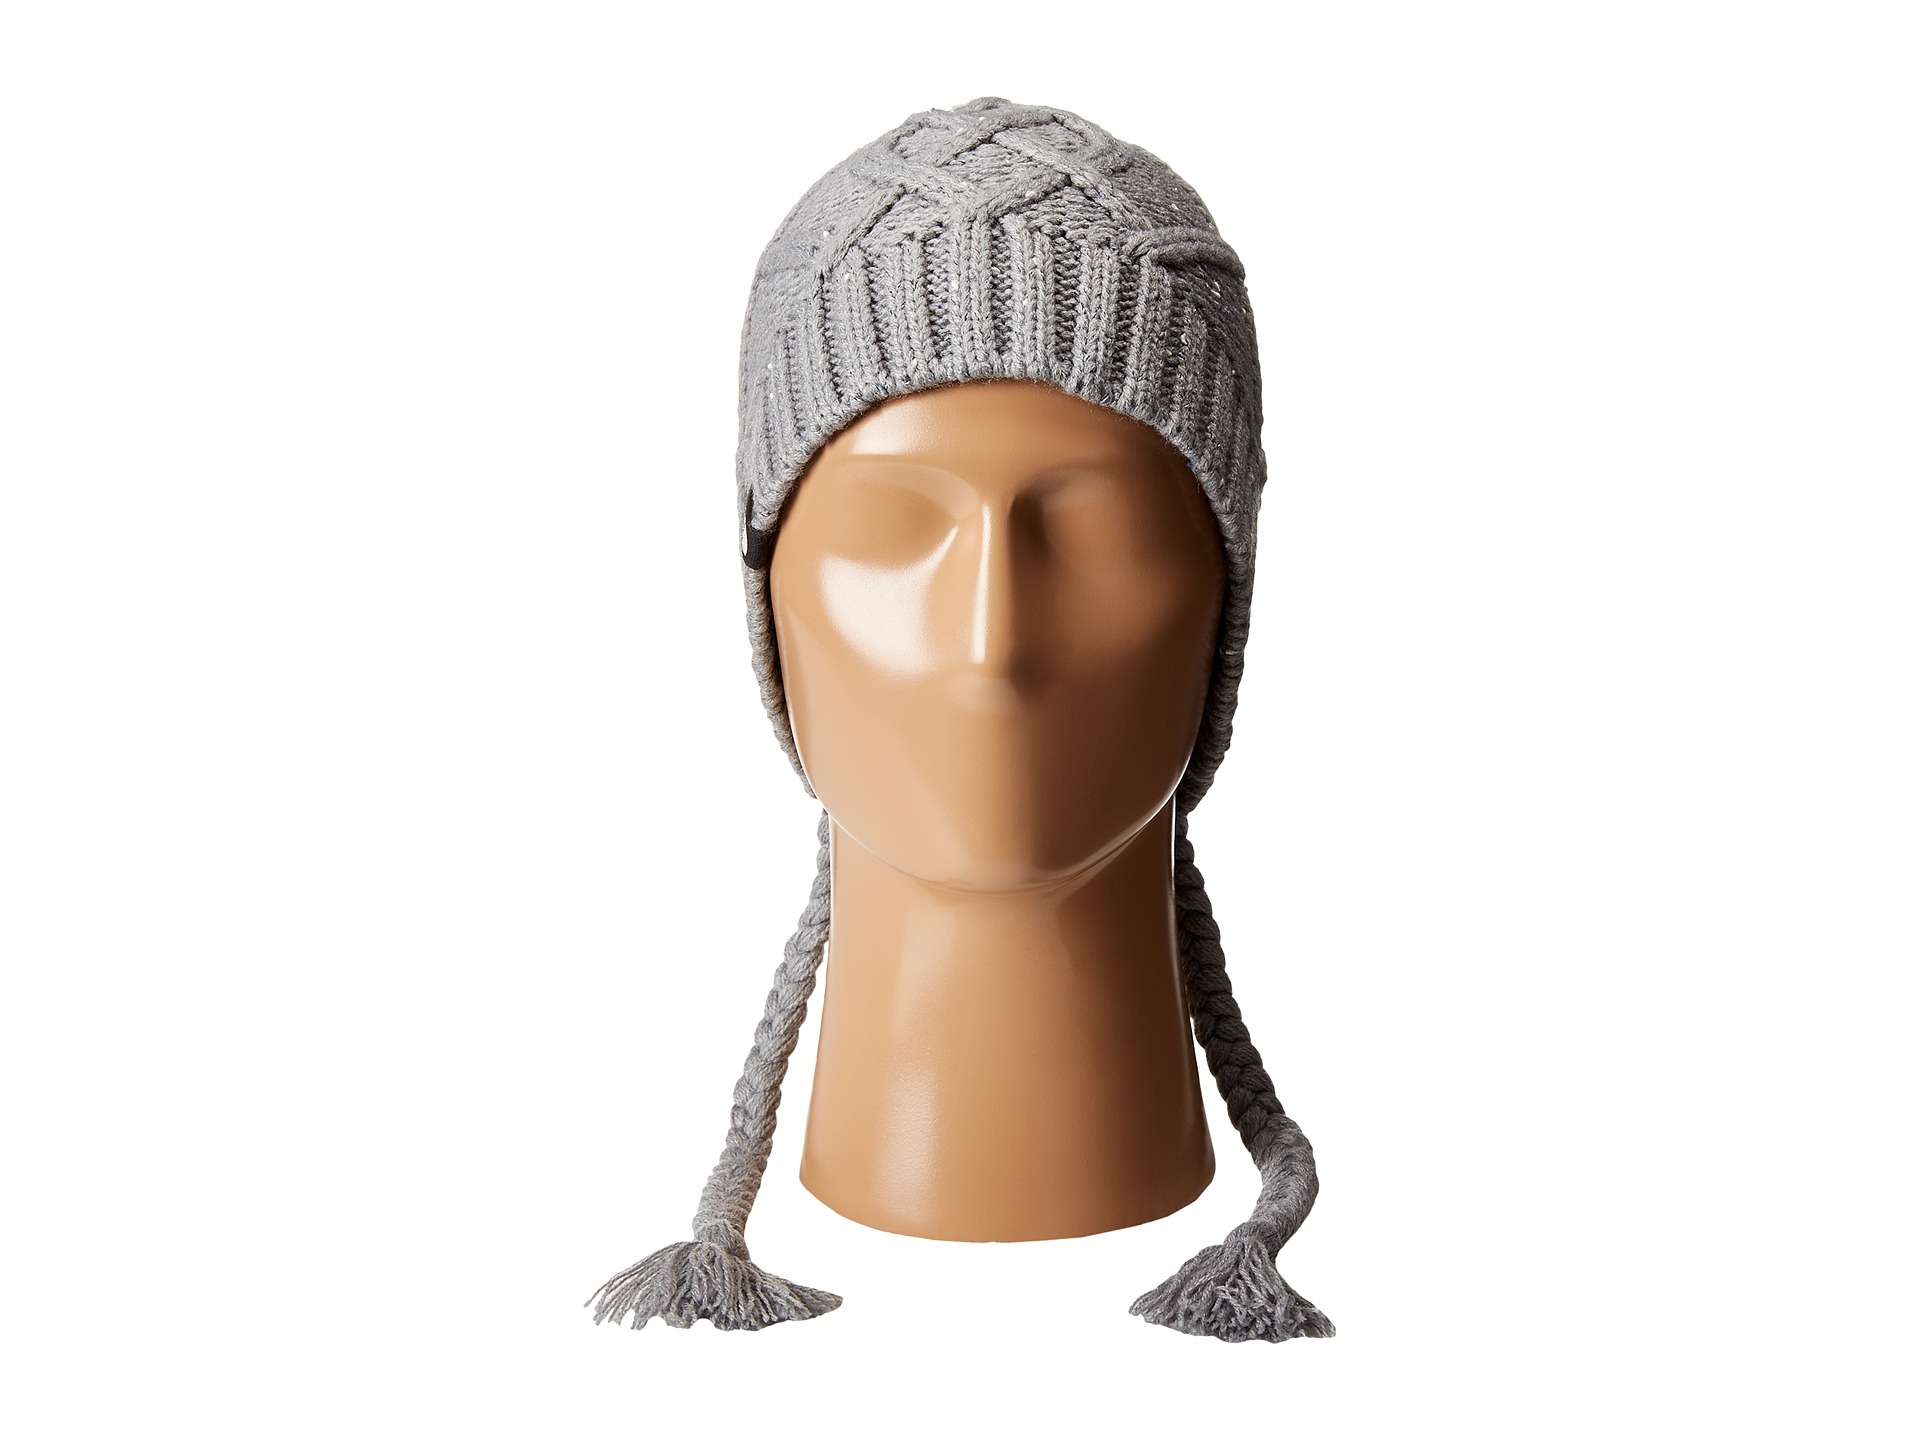 b779839e27e Lyst - The North Face Flecka Earflap Beanie in Gray for Men